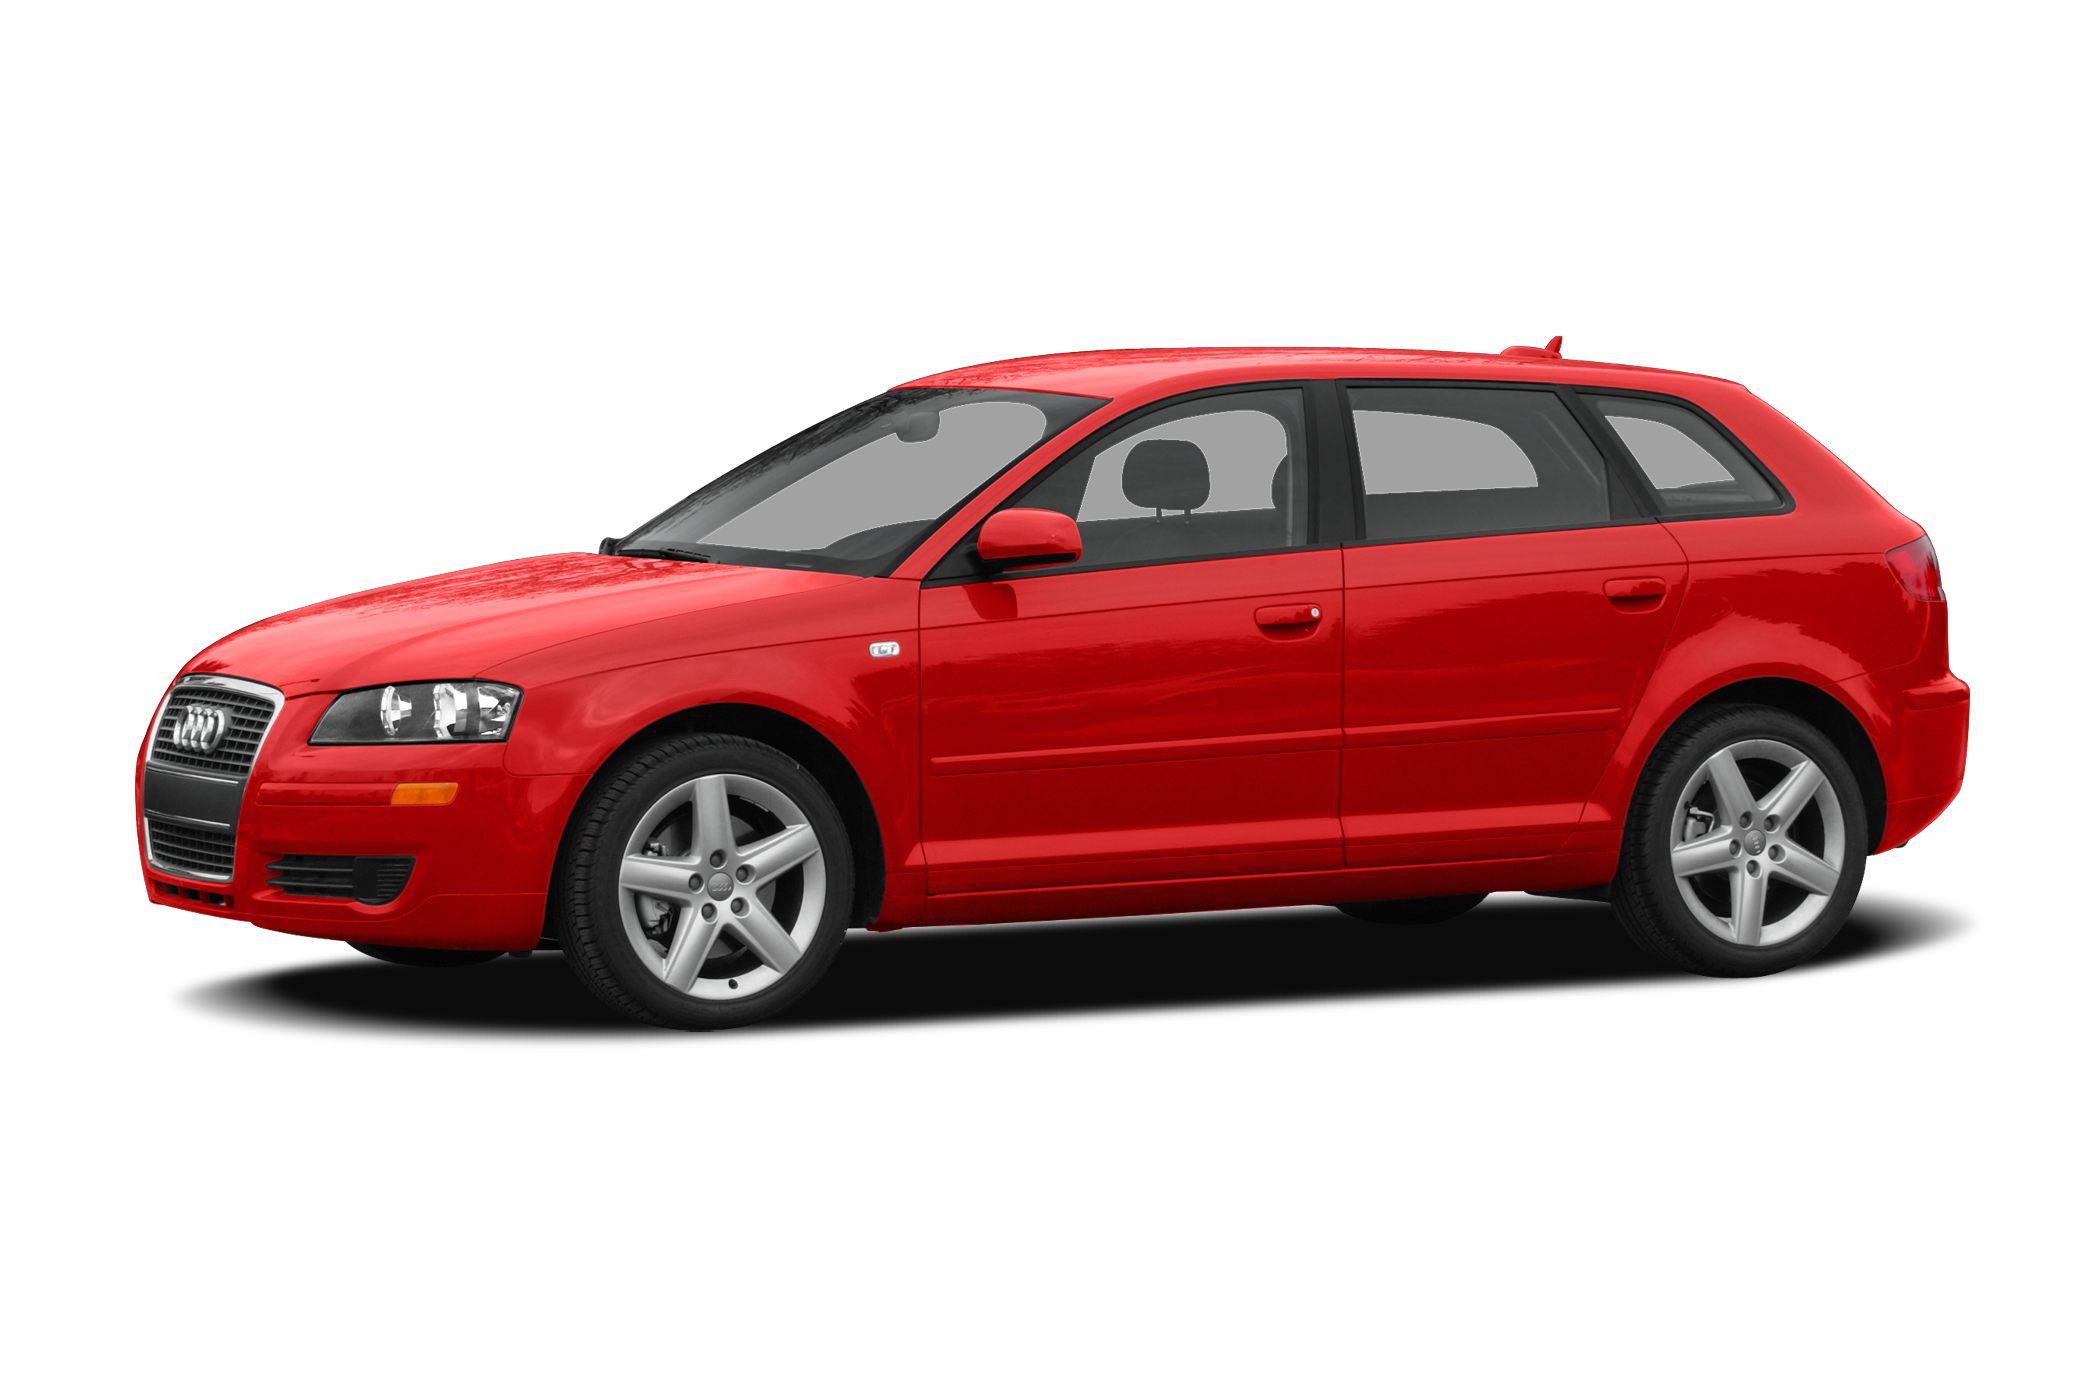 2008 Audi A3 Information